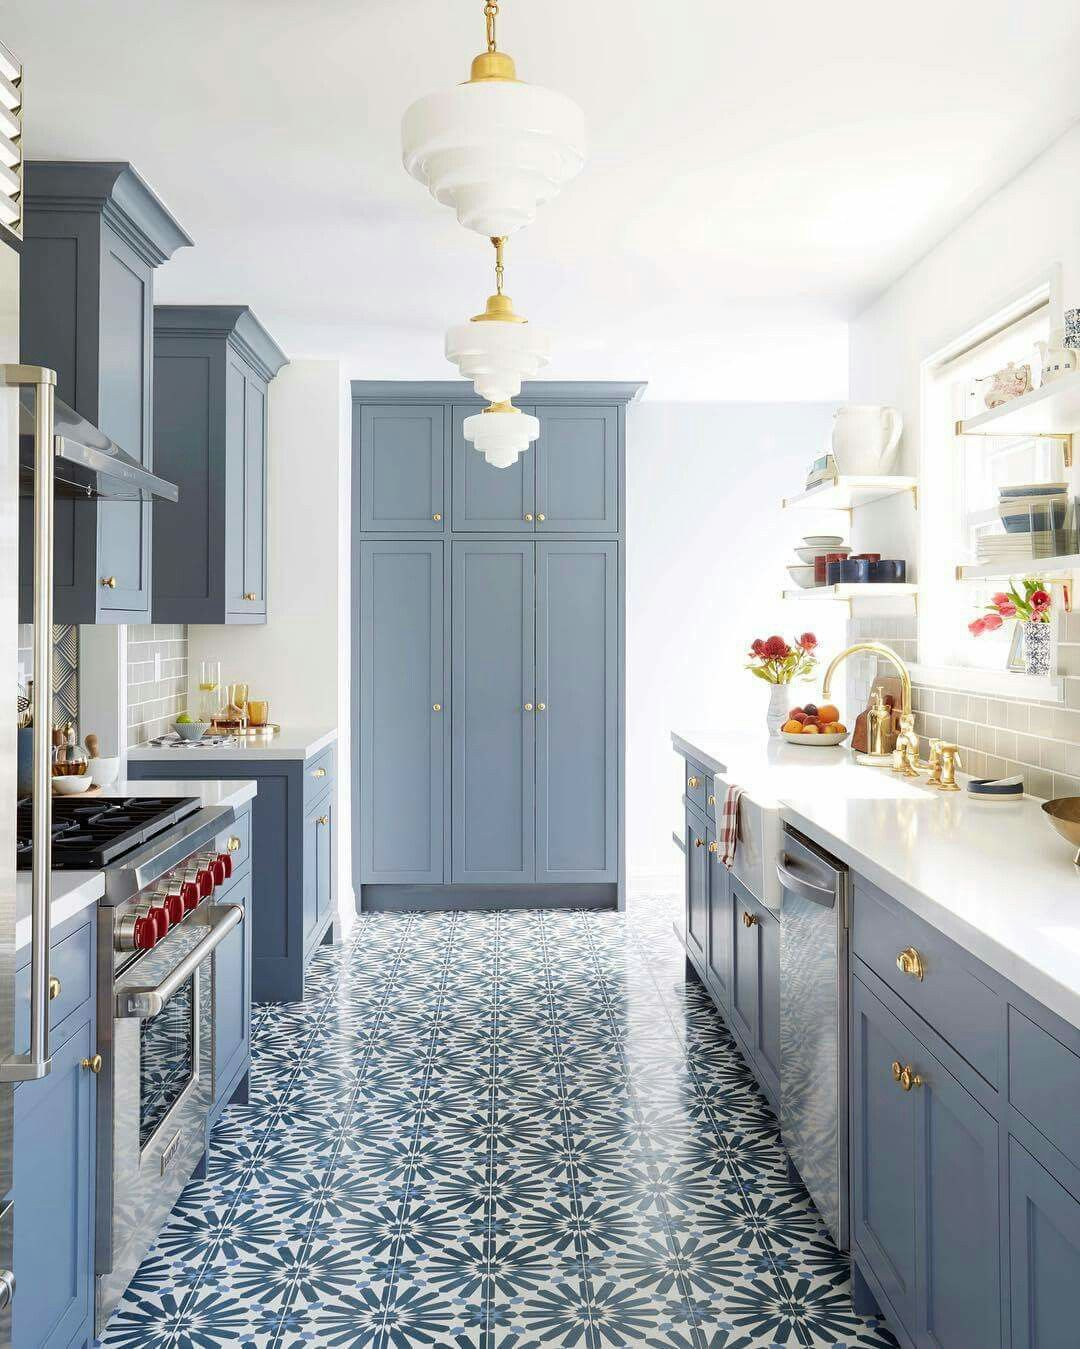 Pin by Karen Conlon on Dream Kitchen   Pinterest   Kitchens, House ...